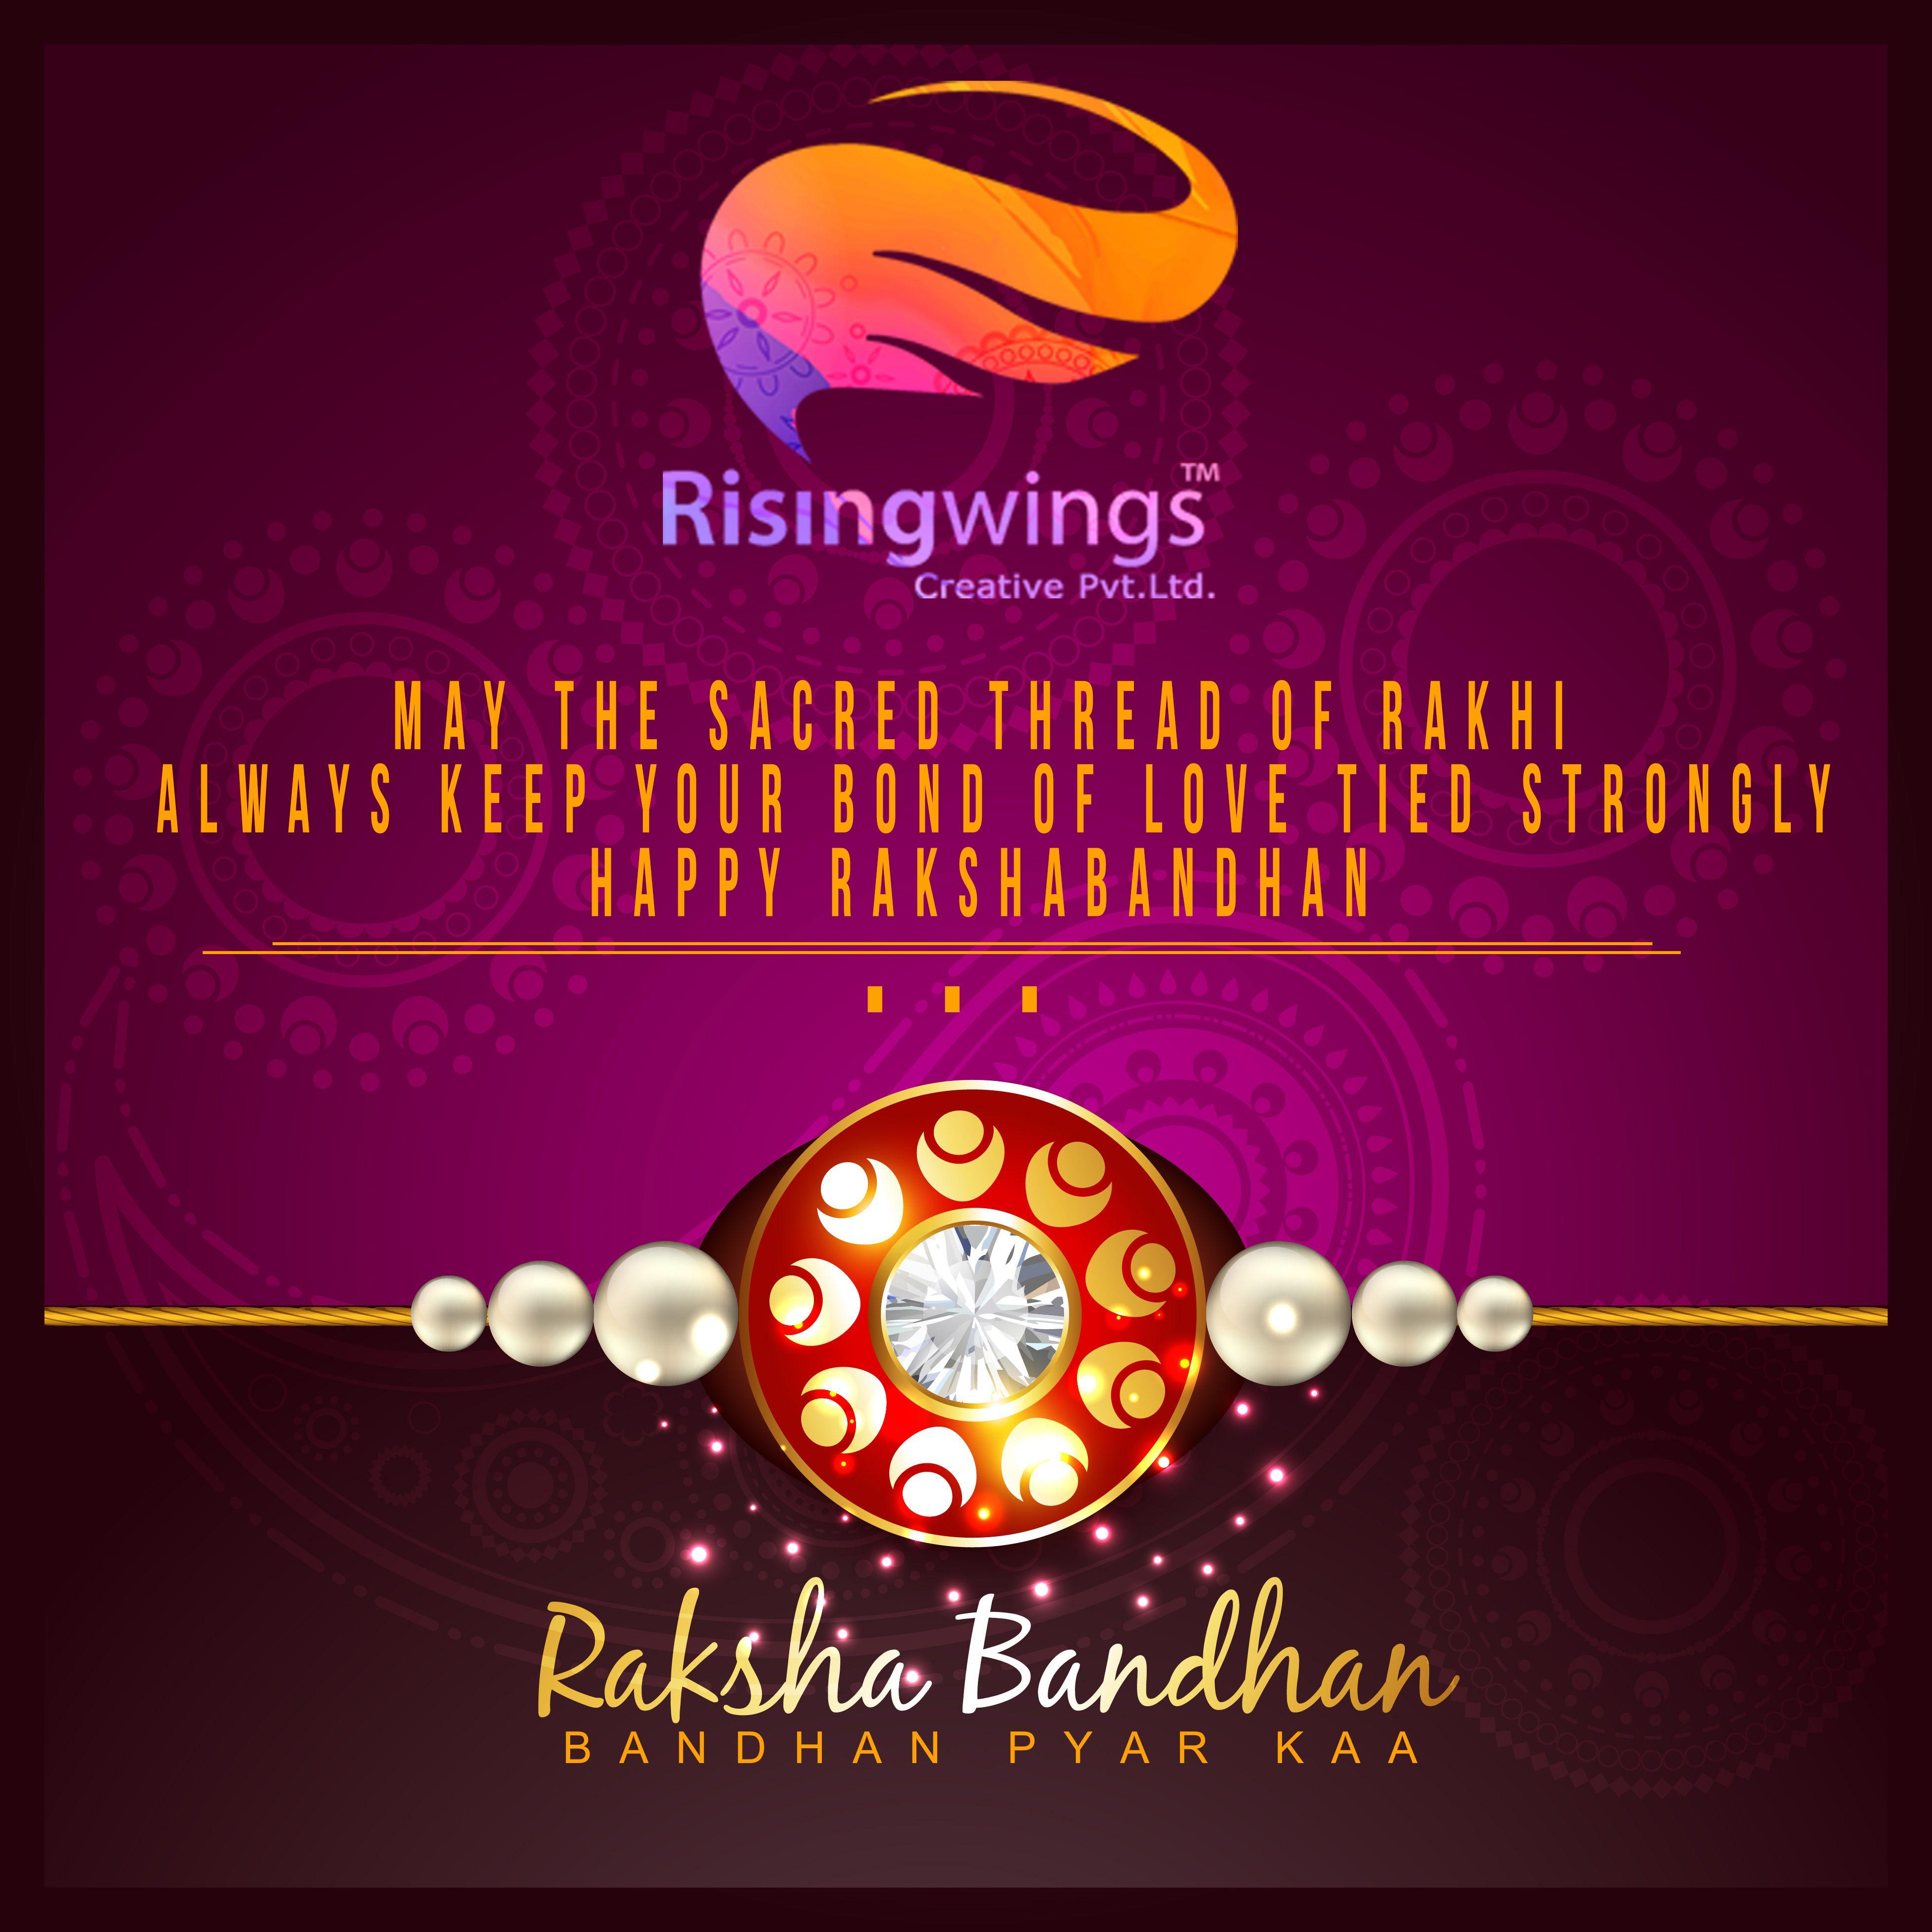 SEO company in Surat Rising Wings Creative Pvt. Ltd